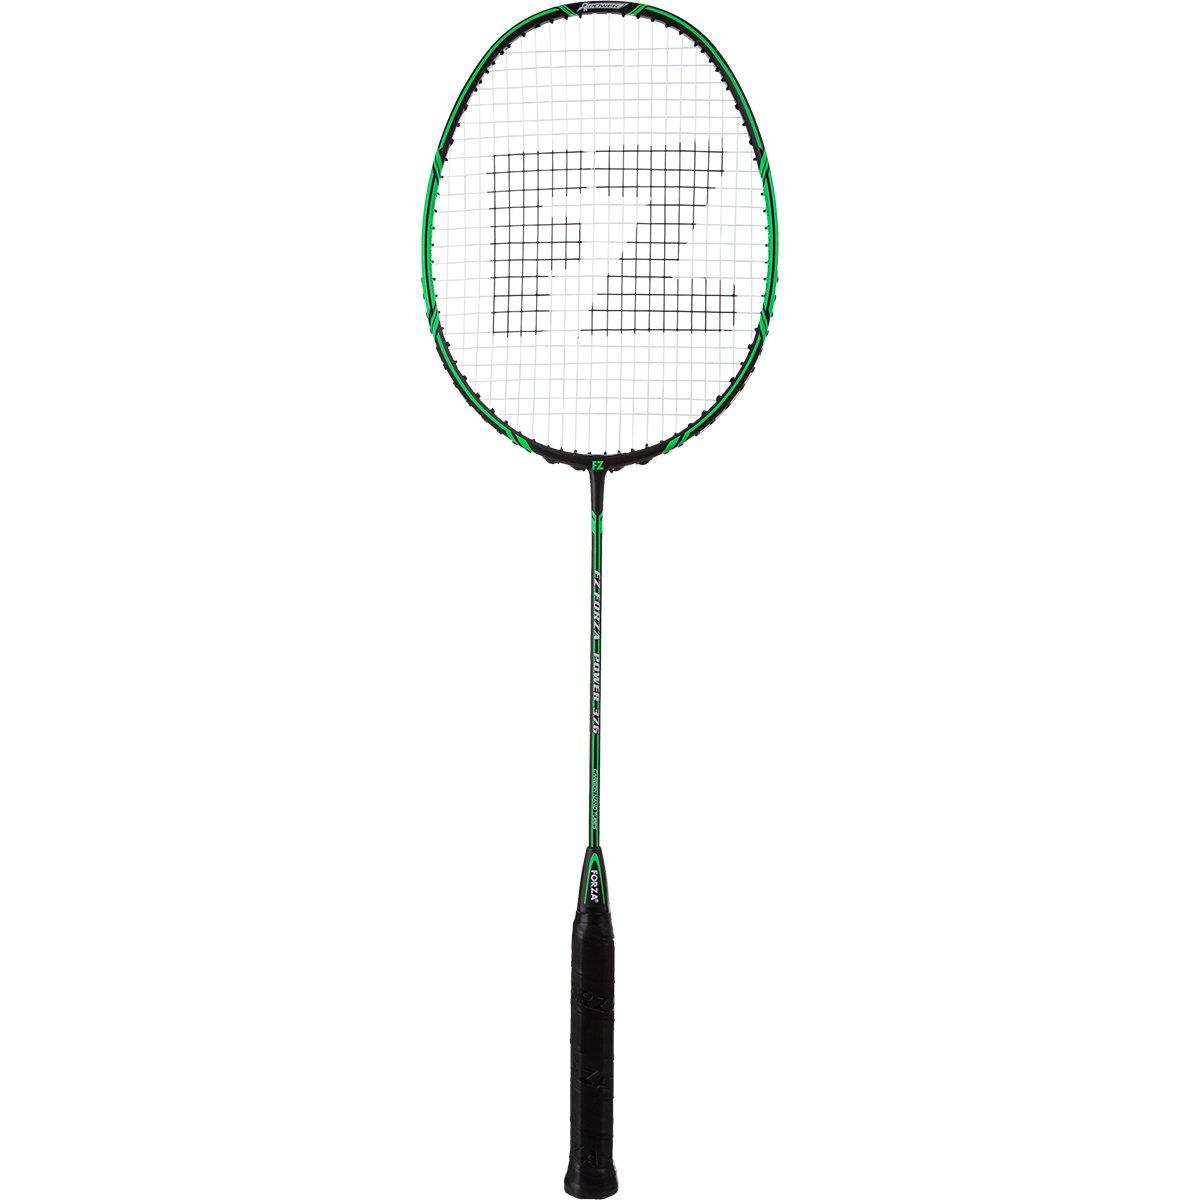 Køb FZ FORZA Power 376 Badmintonketcher